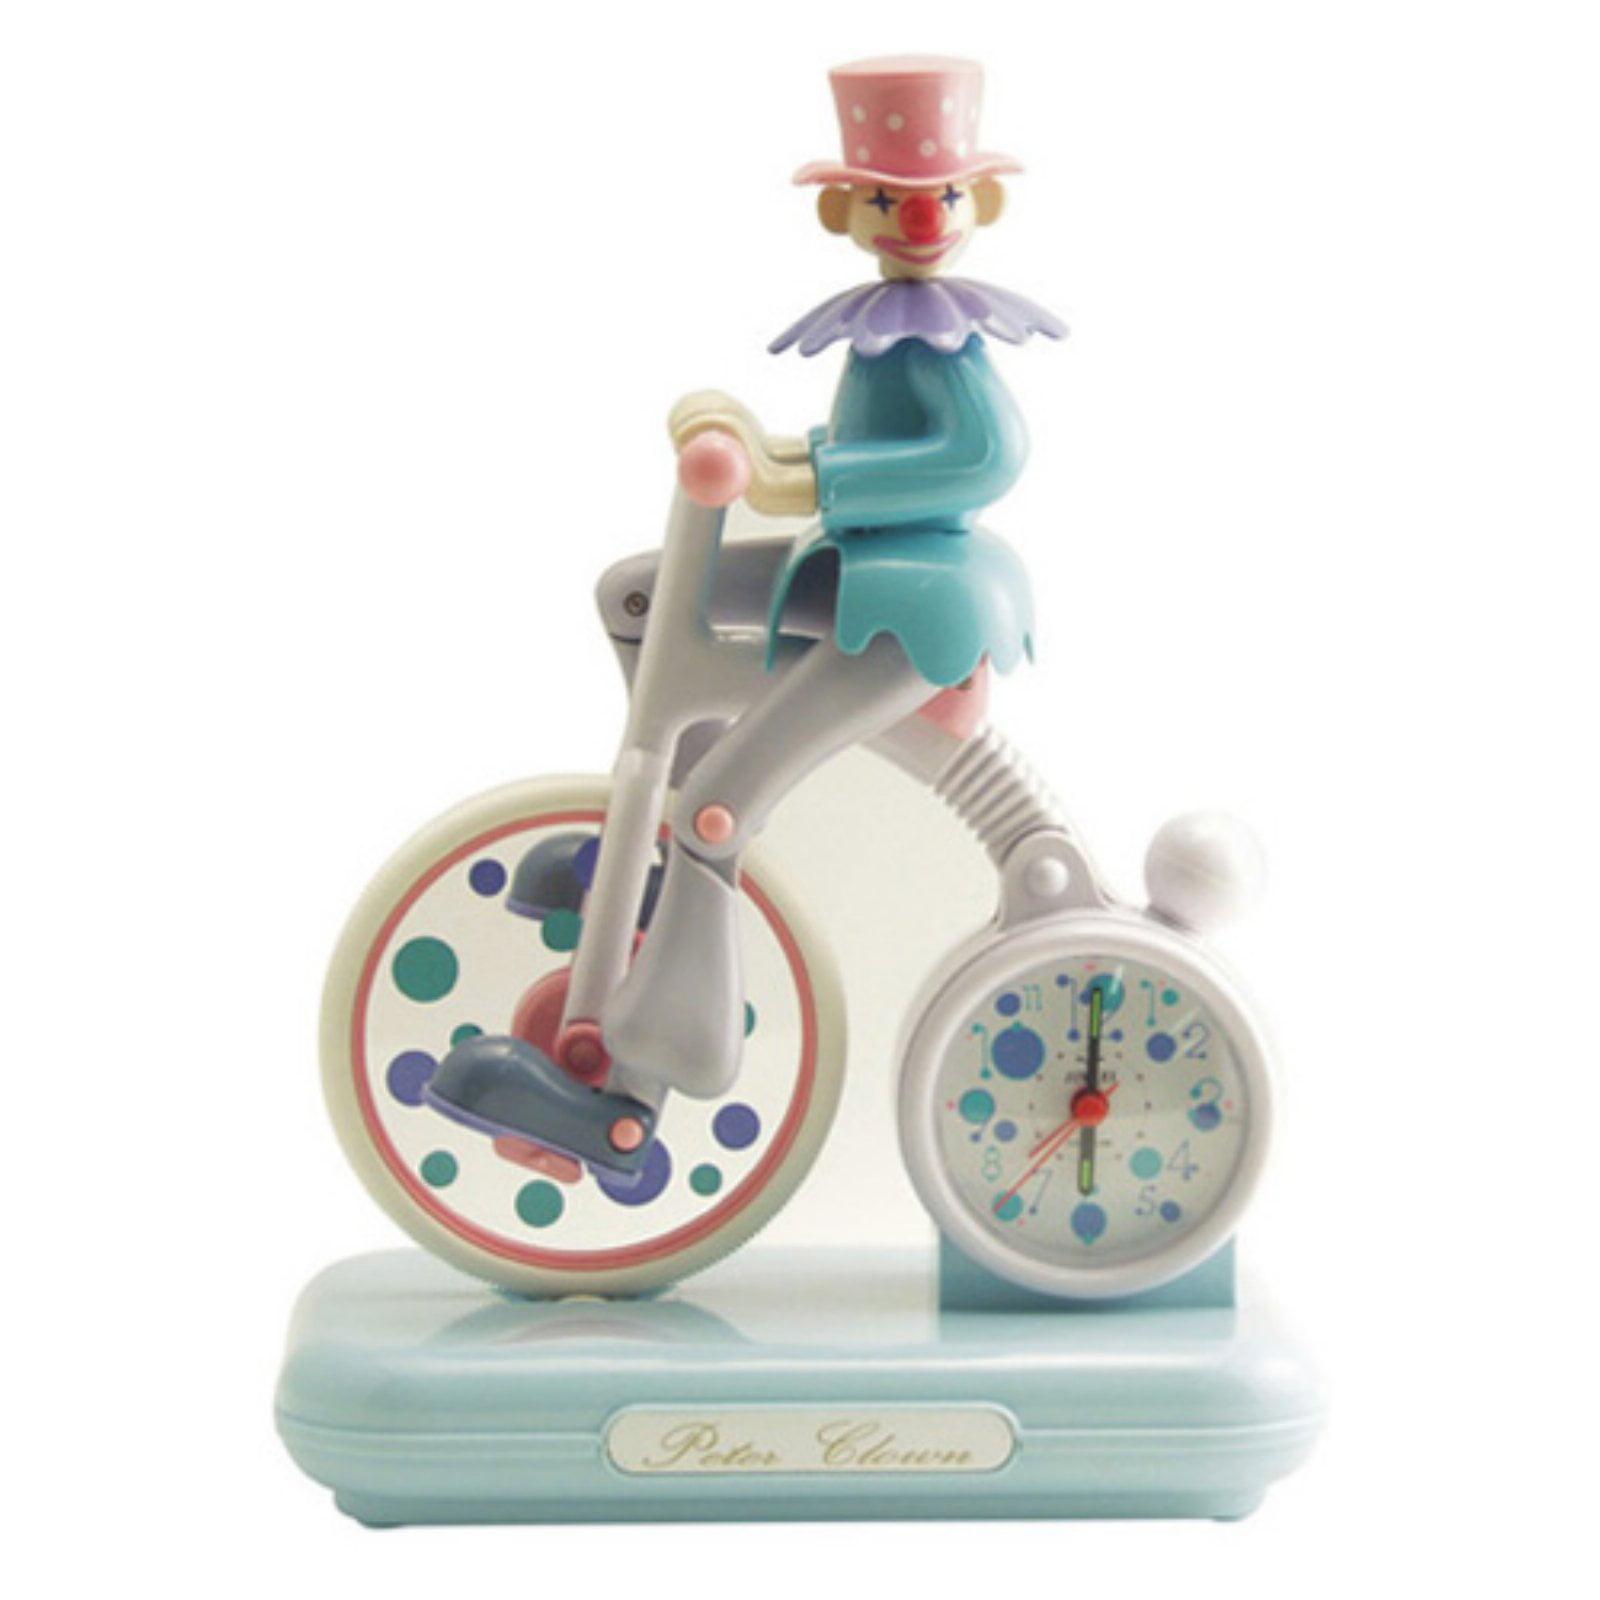 Clown 6.5 in. Alarm Clock by dCOR design